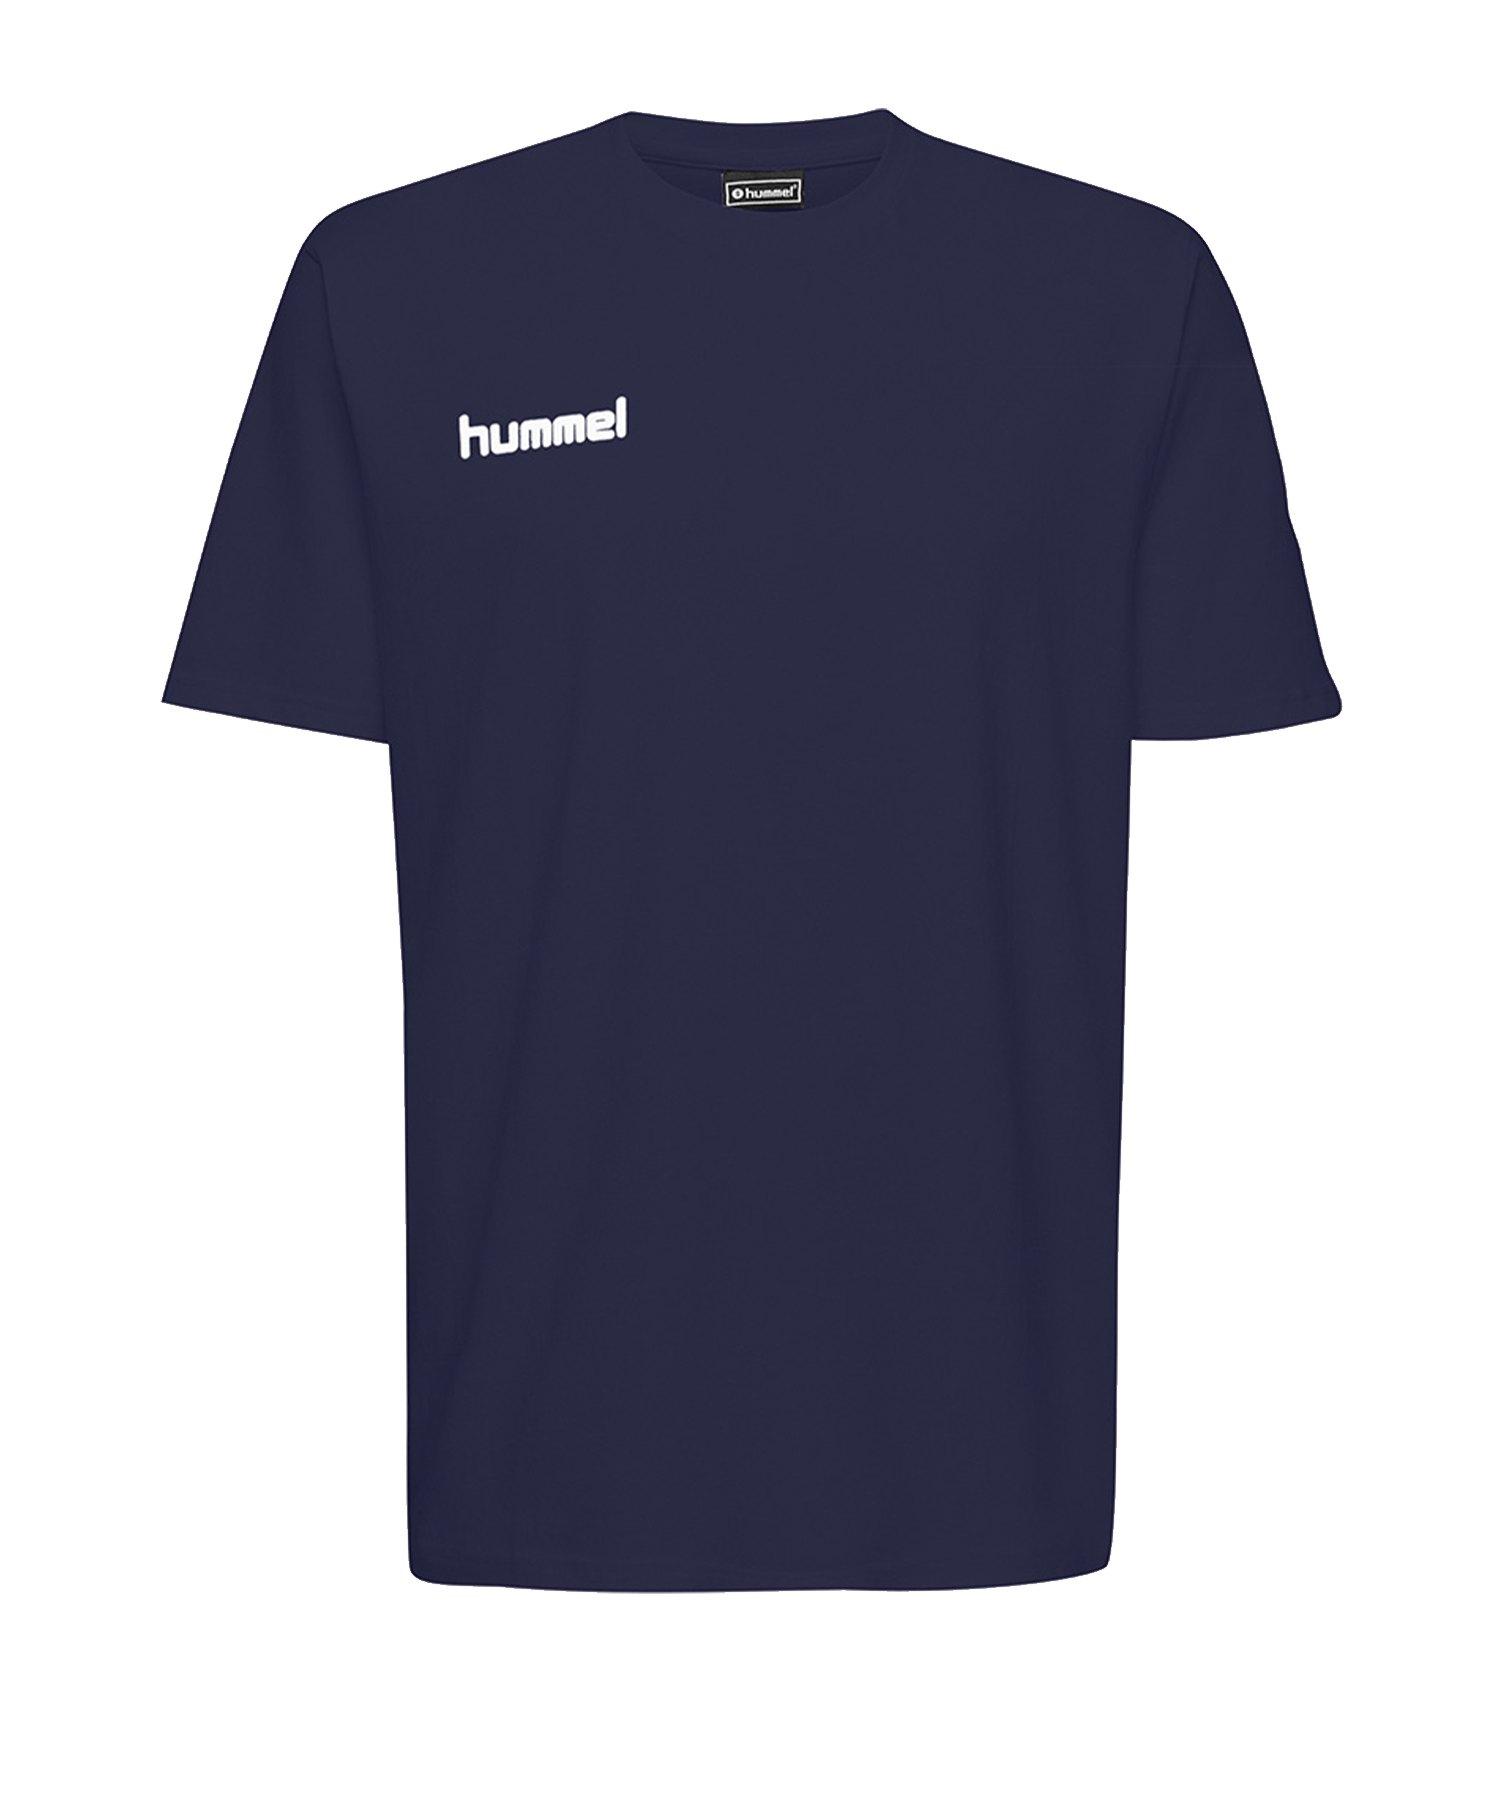 Hummel Cotton T-Shirt Kids Blau F7026 - Blau